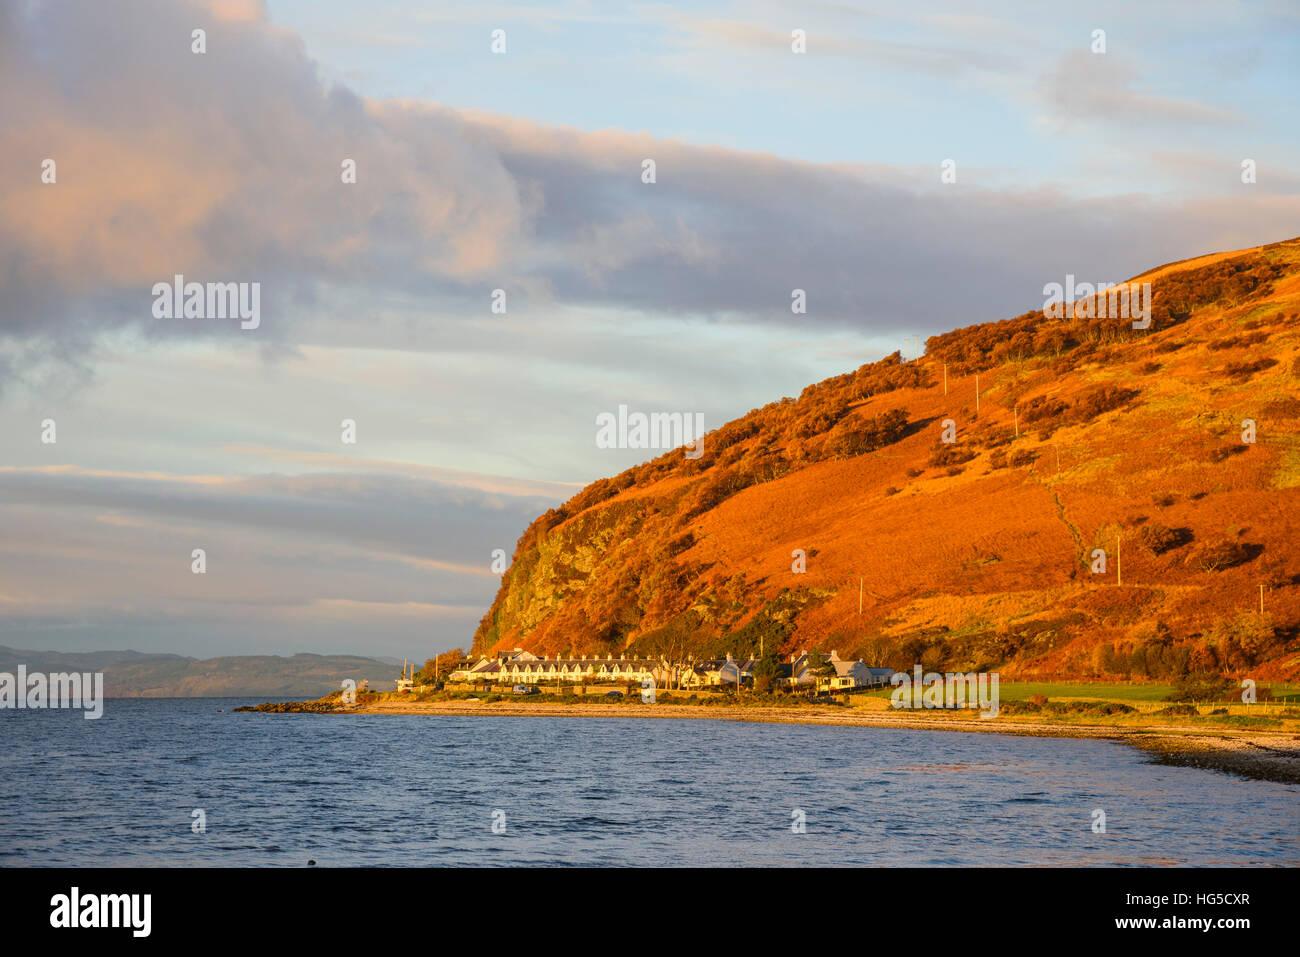 Catacol, Isle of Arran, North Ayrshire, Scotland, United Kingdom - Stock Image